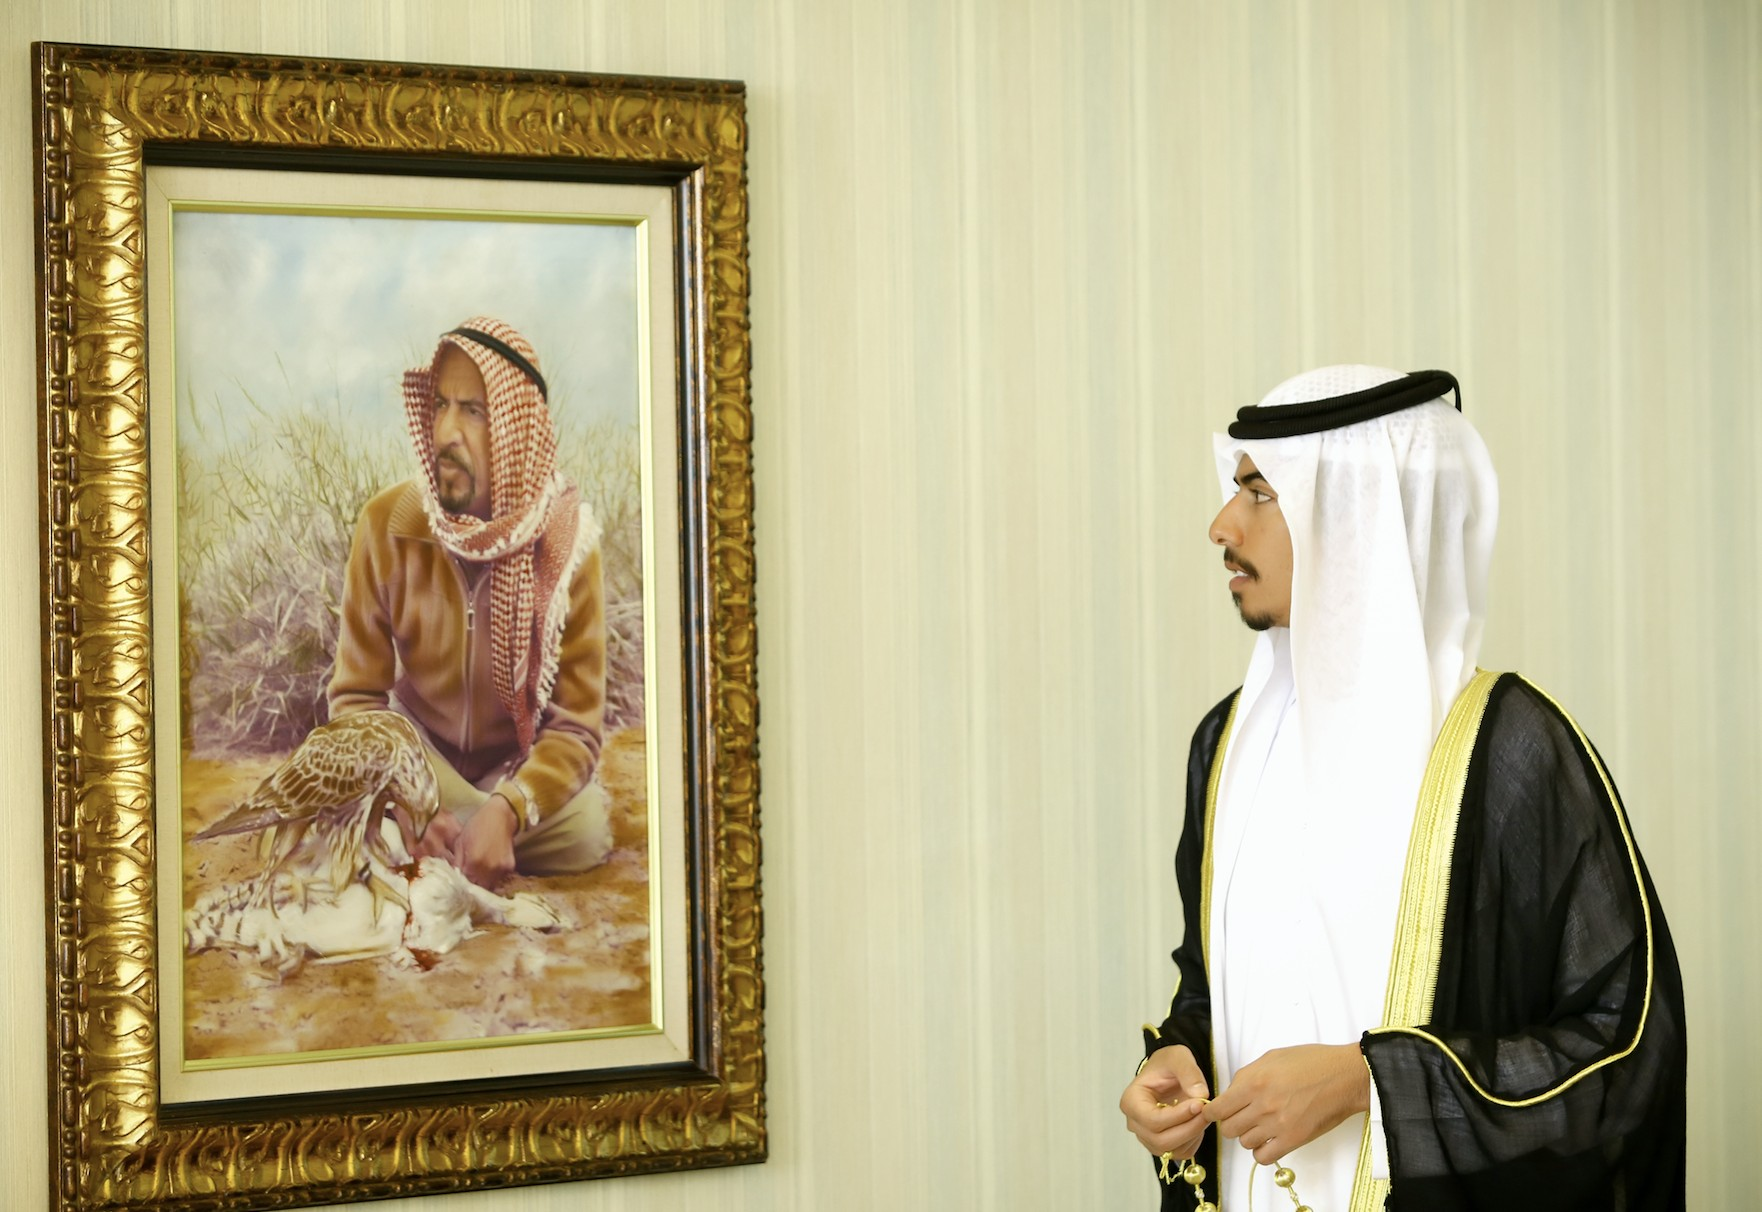 Private Office of Sheikh Tahnoon Bin Saeed Bin Tahnoon Al